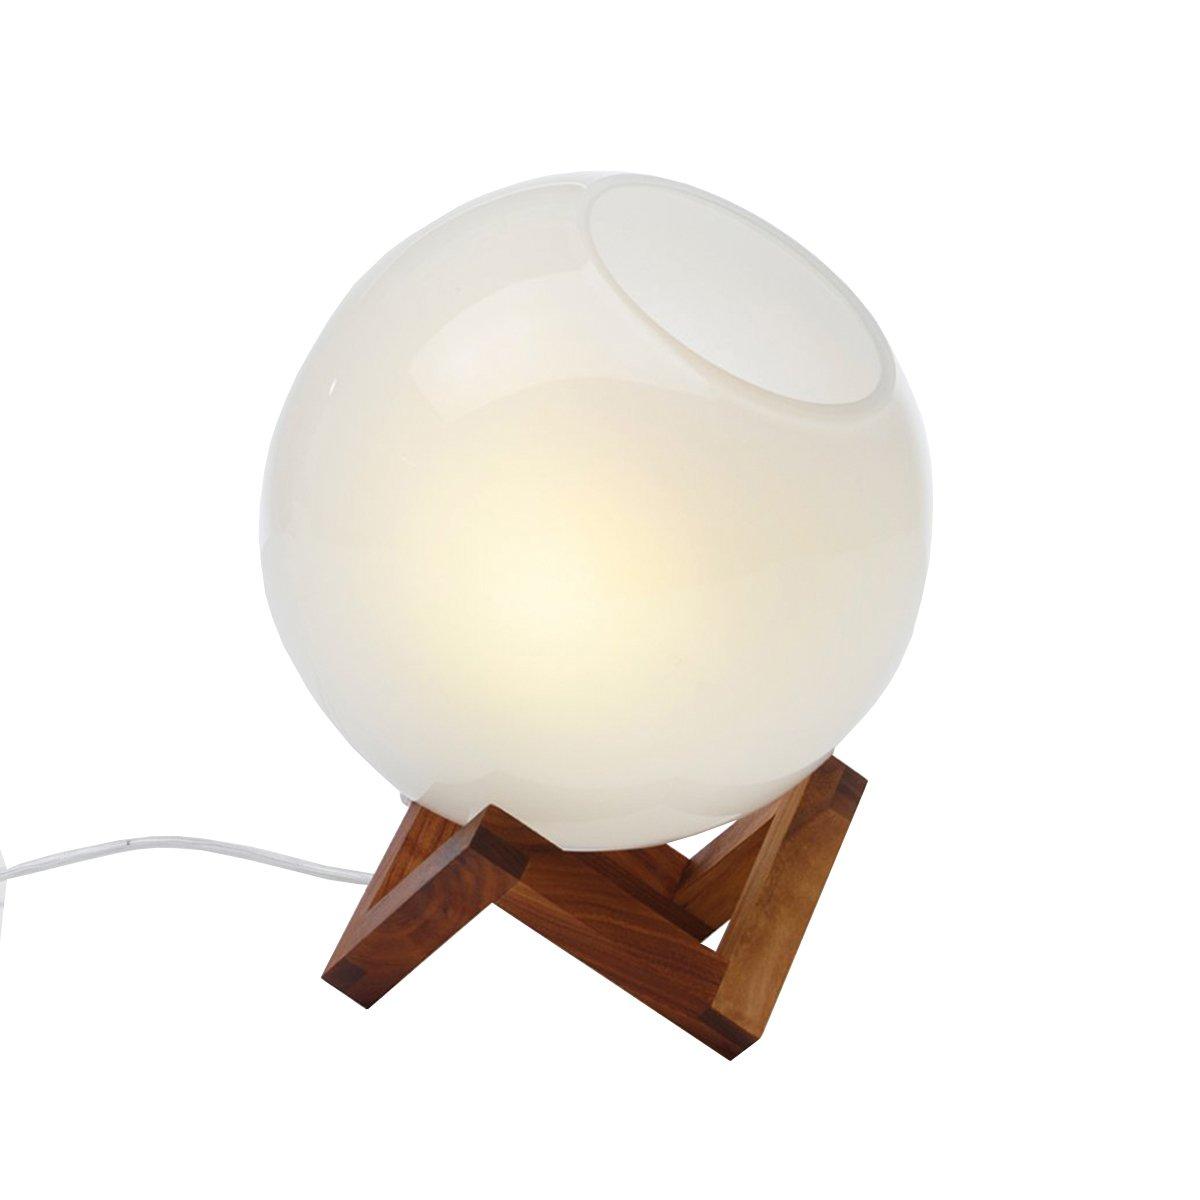 Per/Use MCE Tafellamp